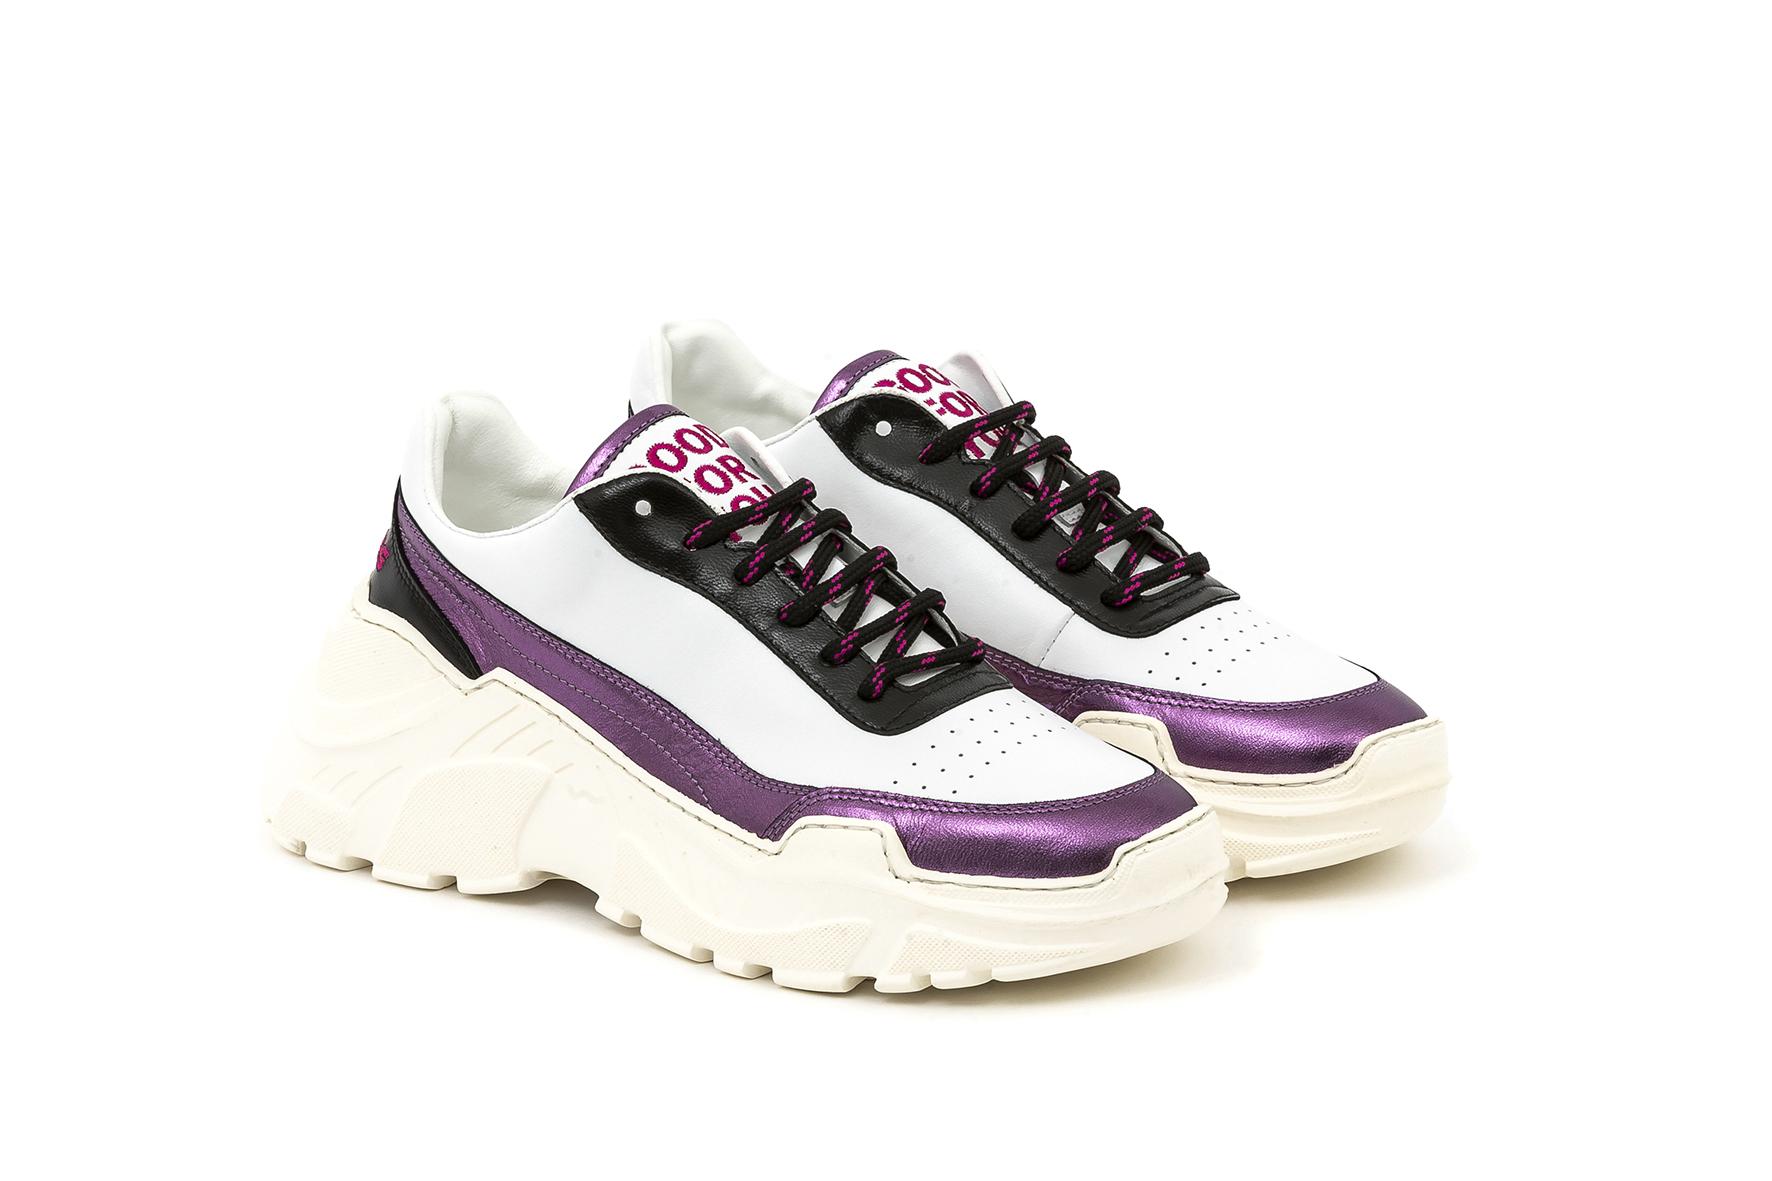 IRENEISGOOD x JOSHUAS 聯名系列鞋款 (紫)